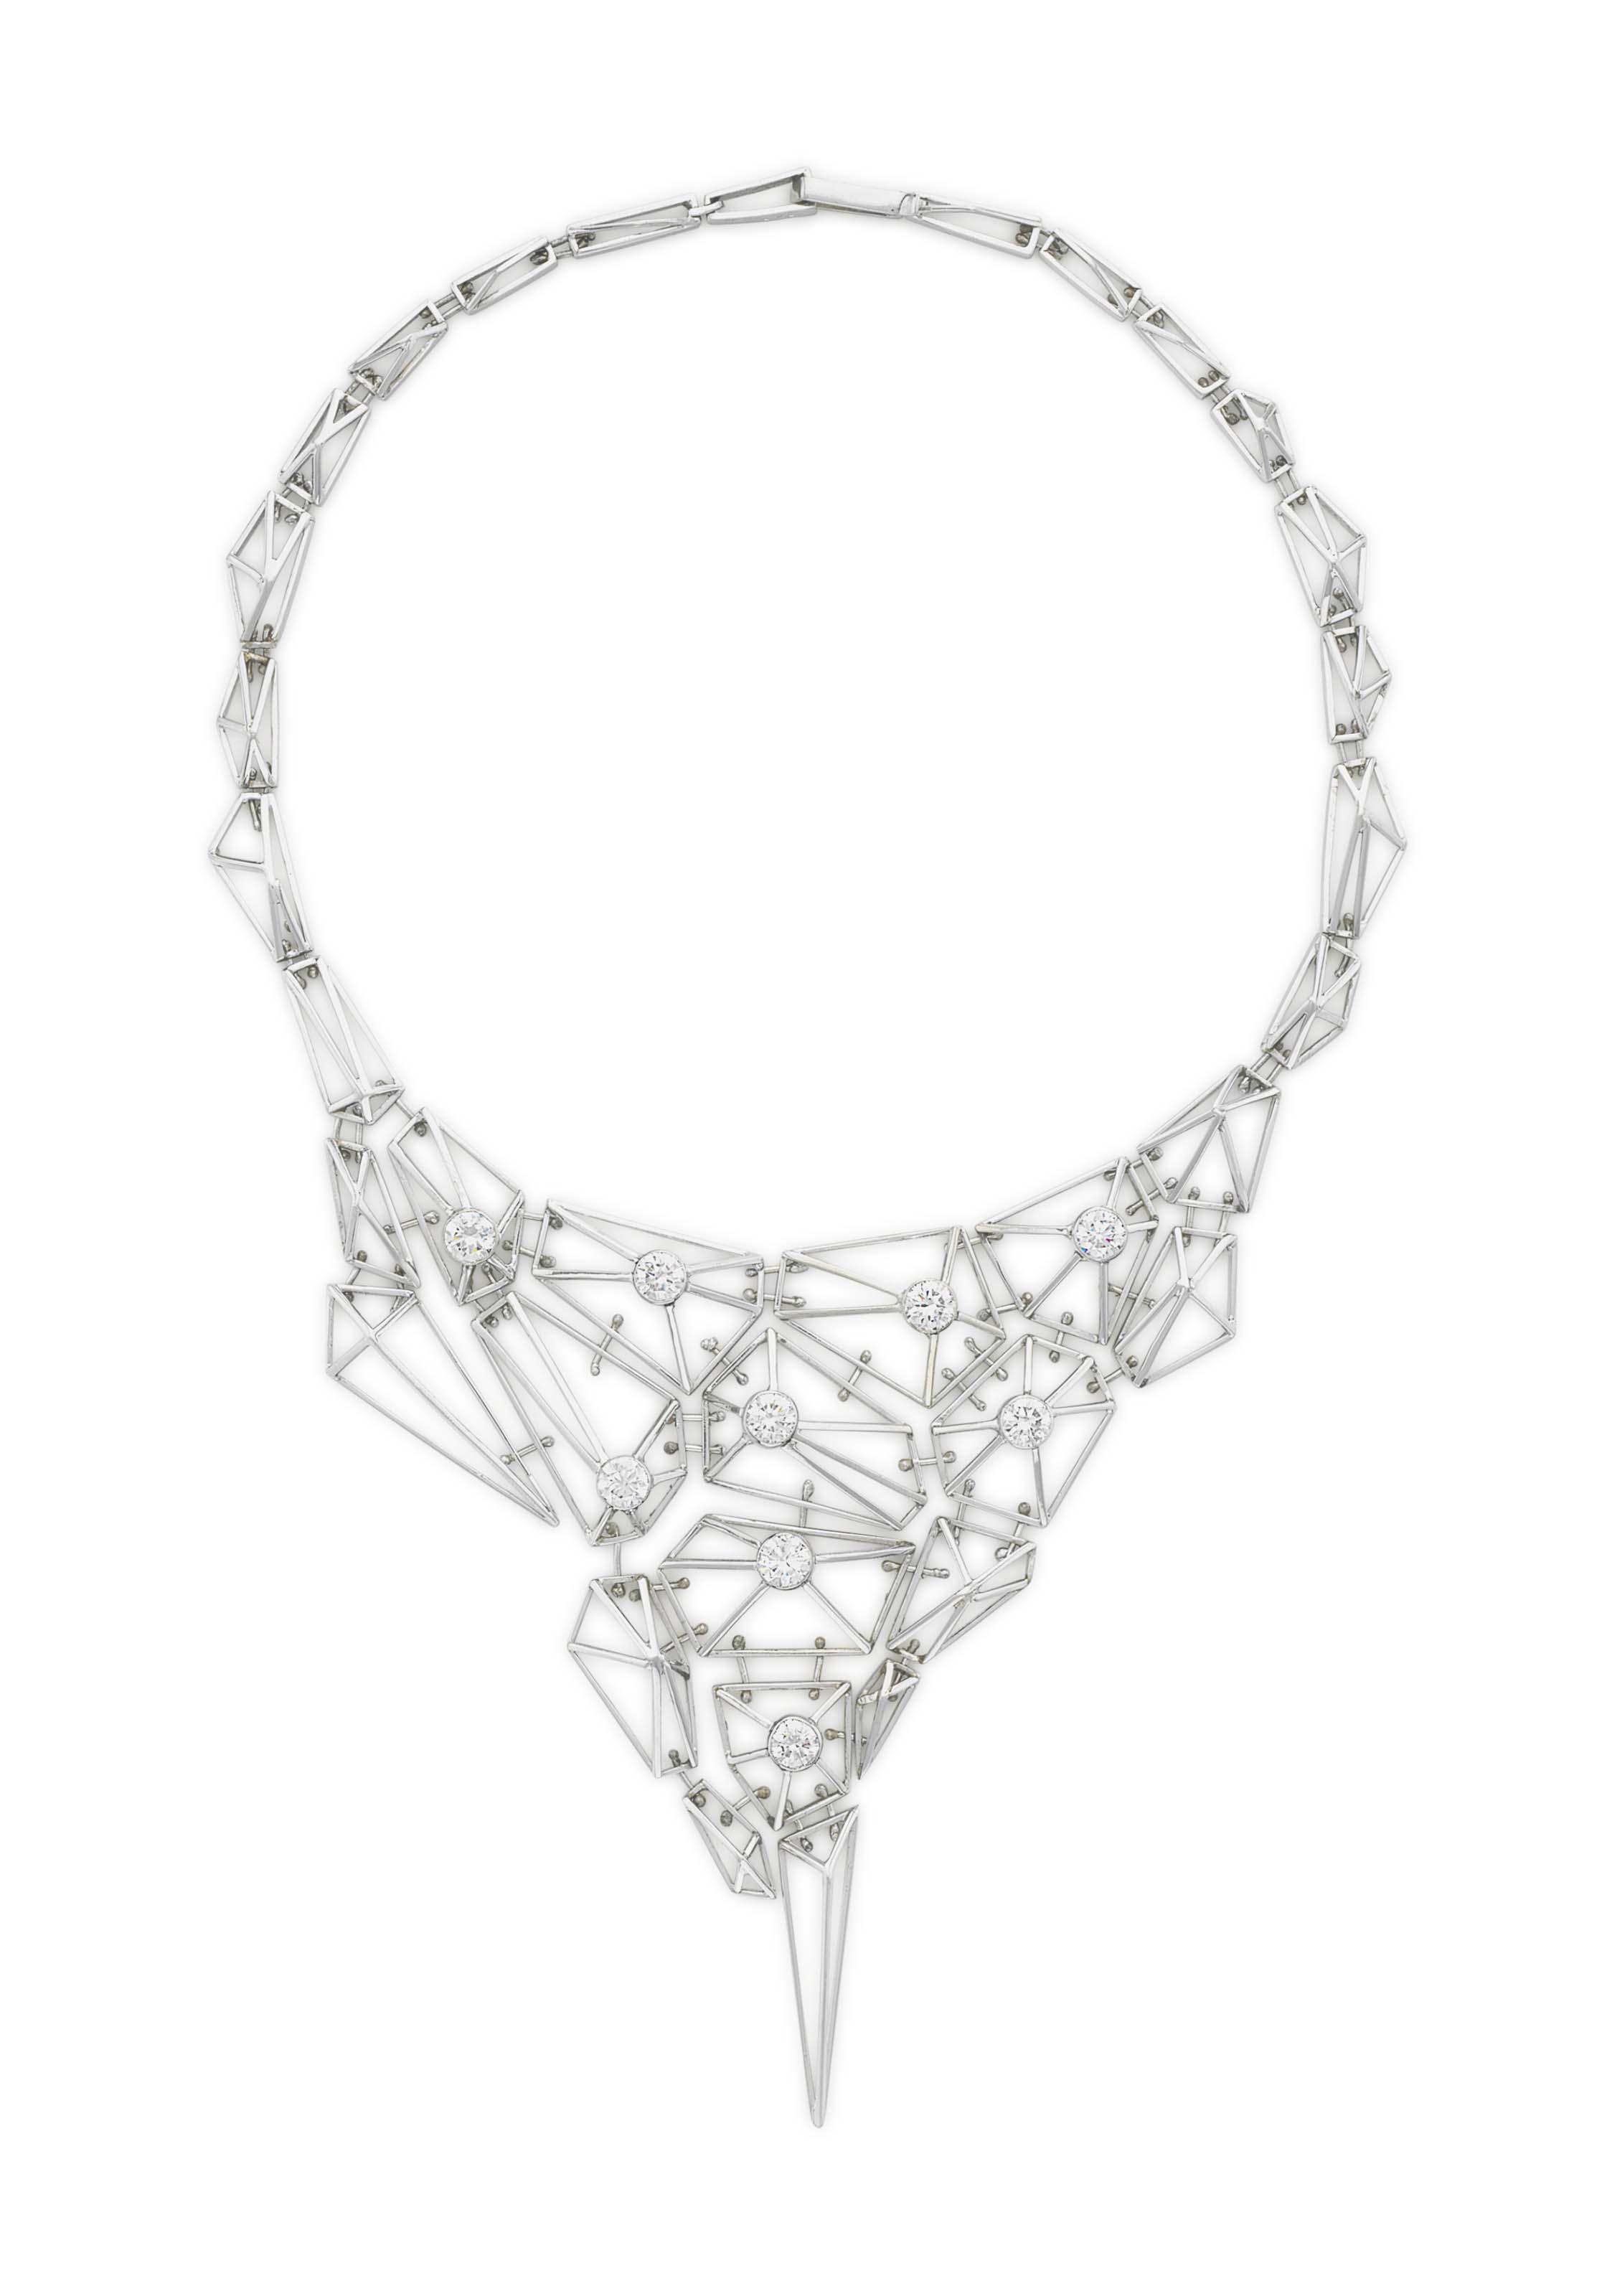 A DIAMOND NECKLACE, BY MARTIN VERNER